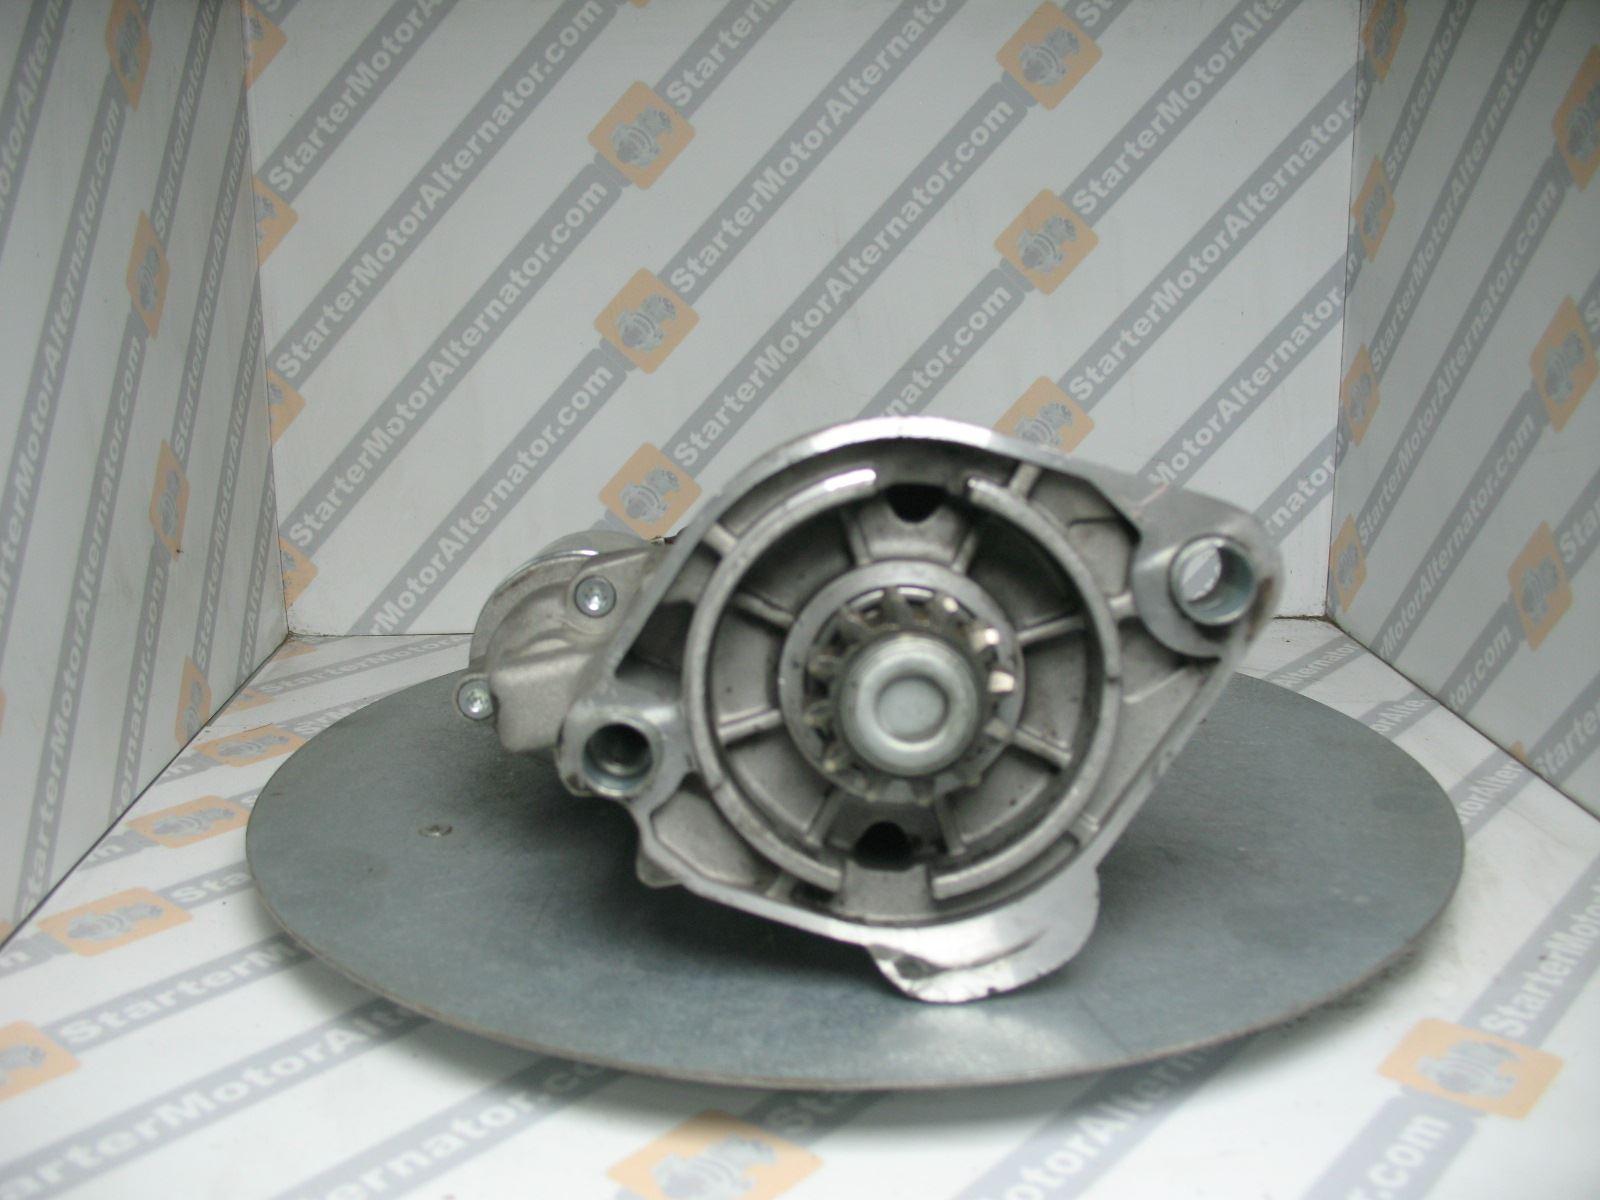 XIY3859 Starter Motor For Volkswagen